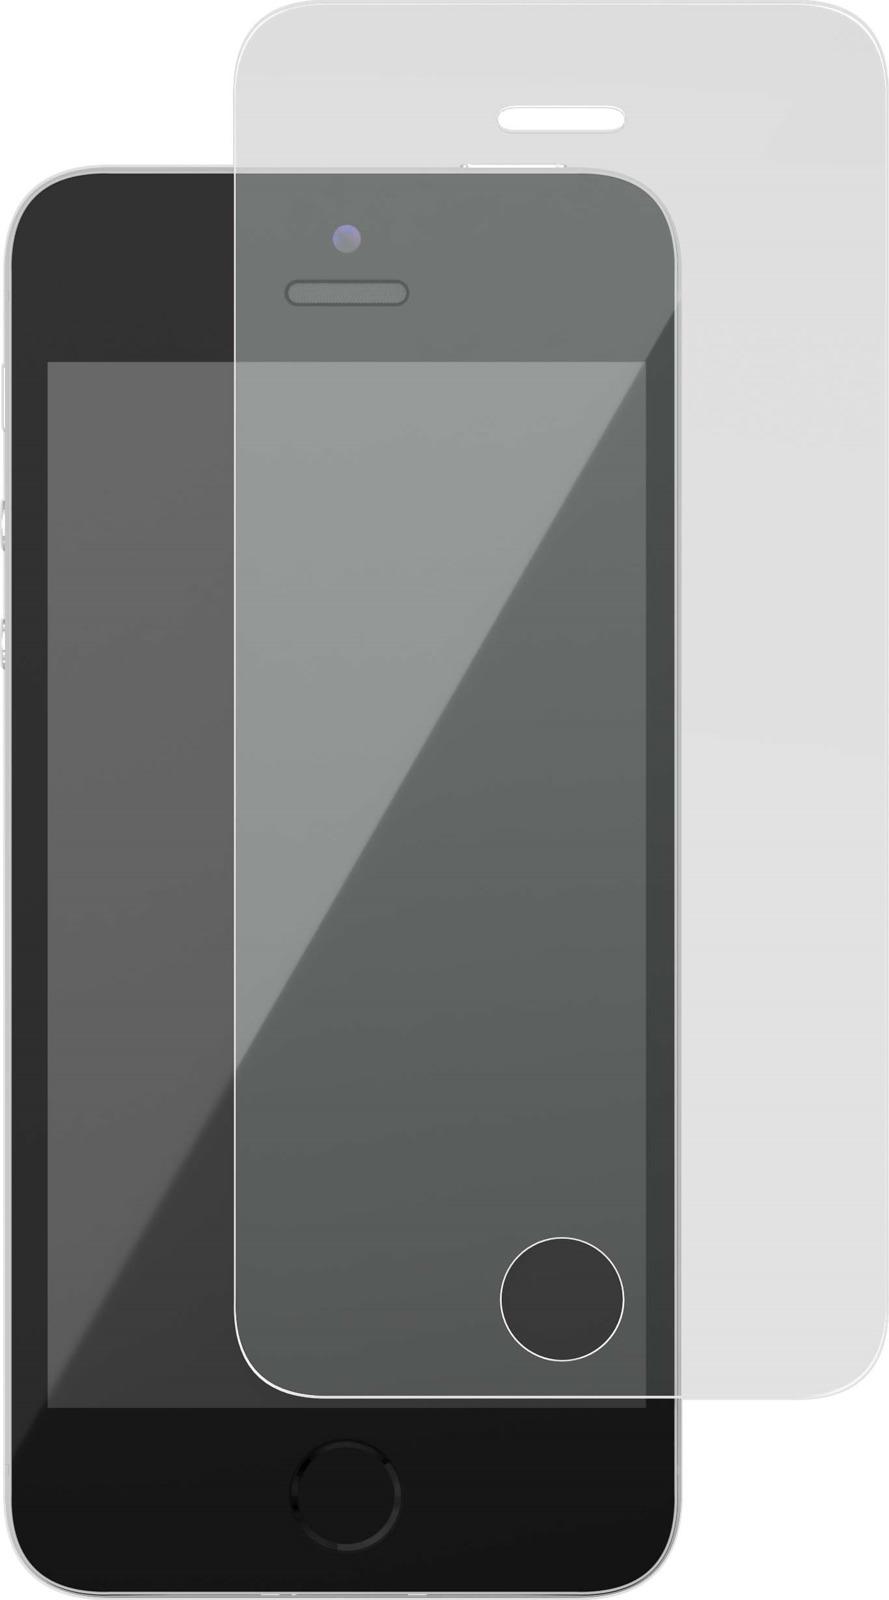 uBear Premium Tempered Glass 2.5D защитное стекло для iPhone SE/5s/5c/5, Clear